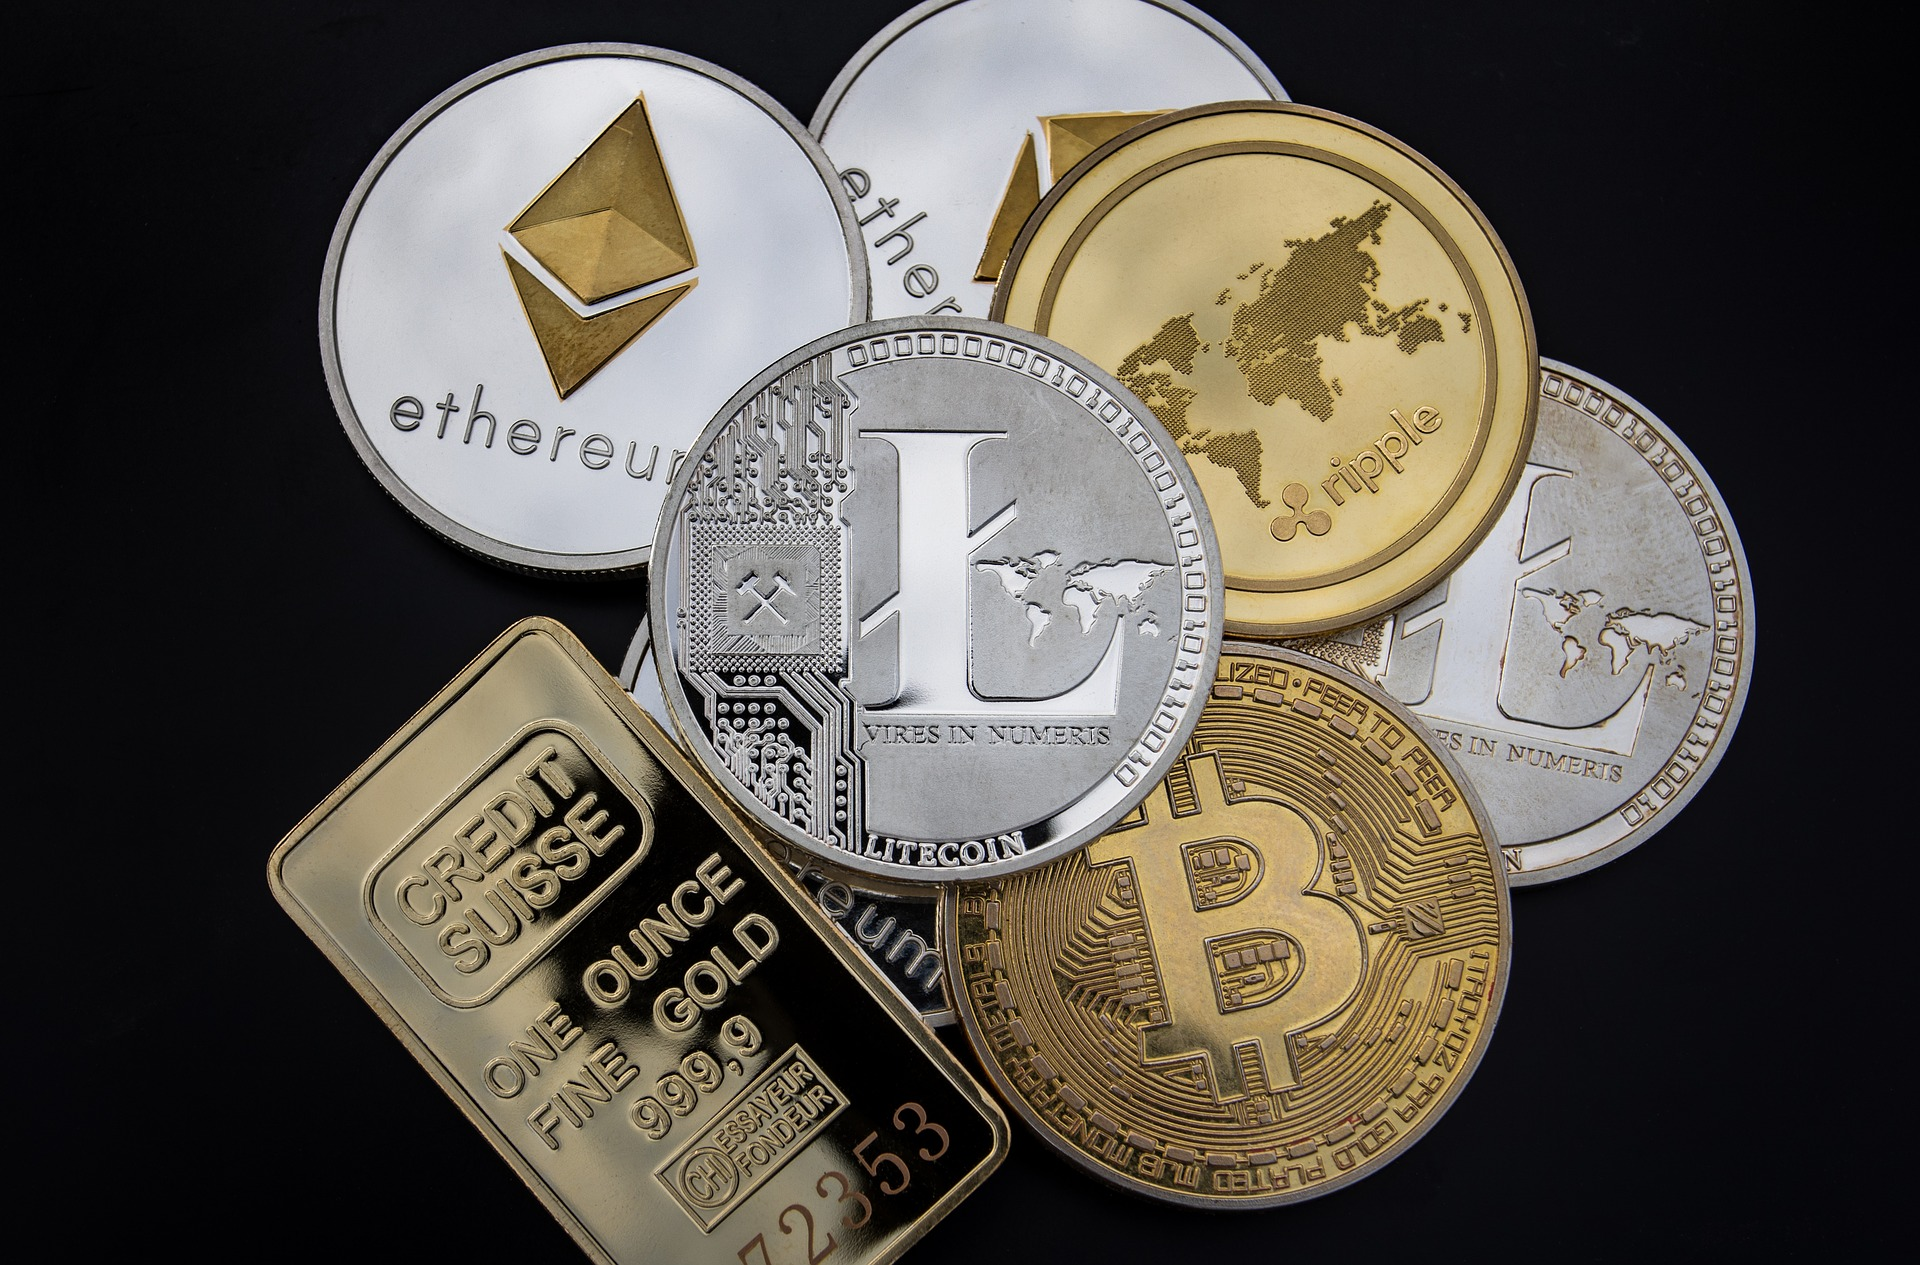 najbolje trgovanje za kripto valutu najbolja kriptovaluta za dugoročno ulaganje 2021